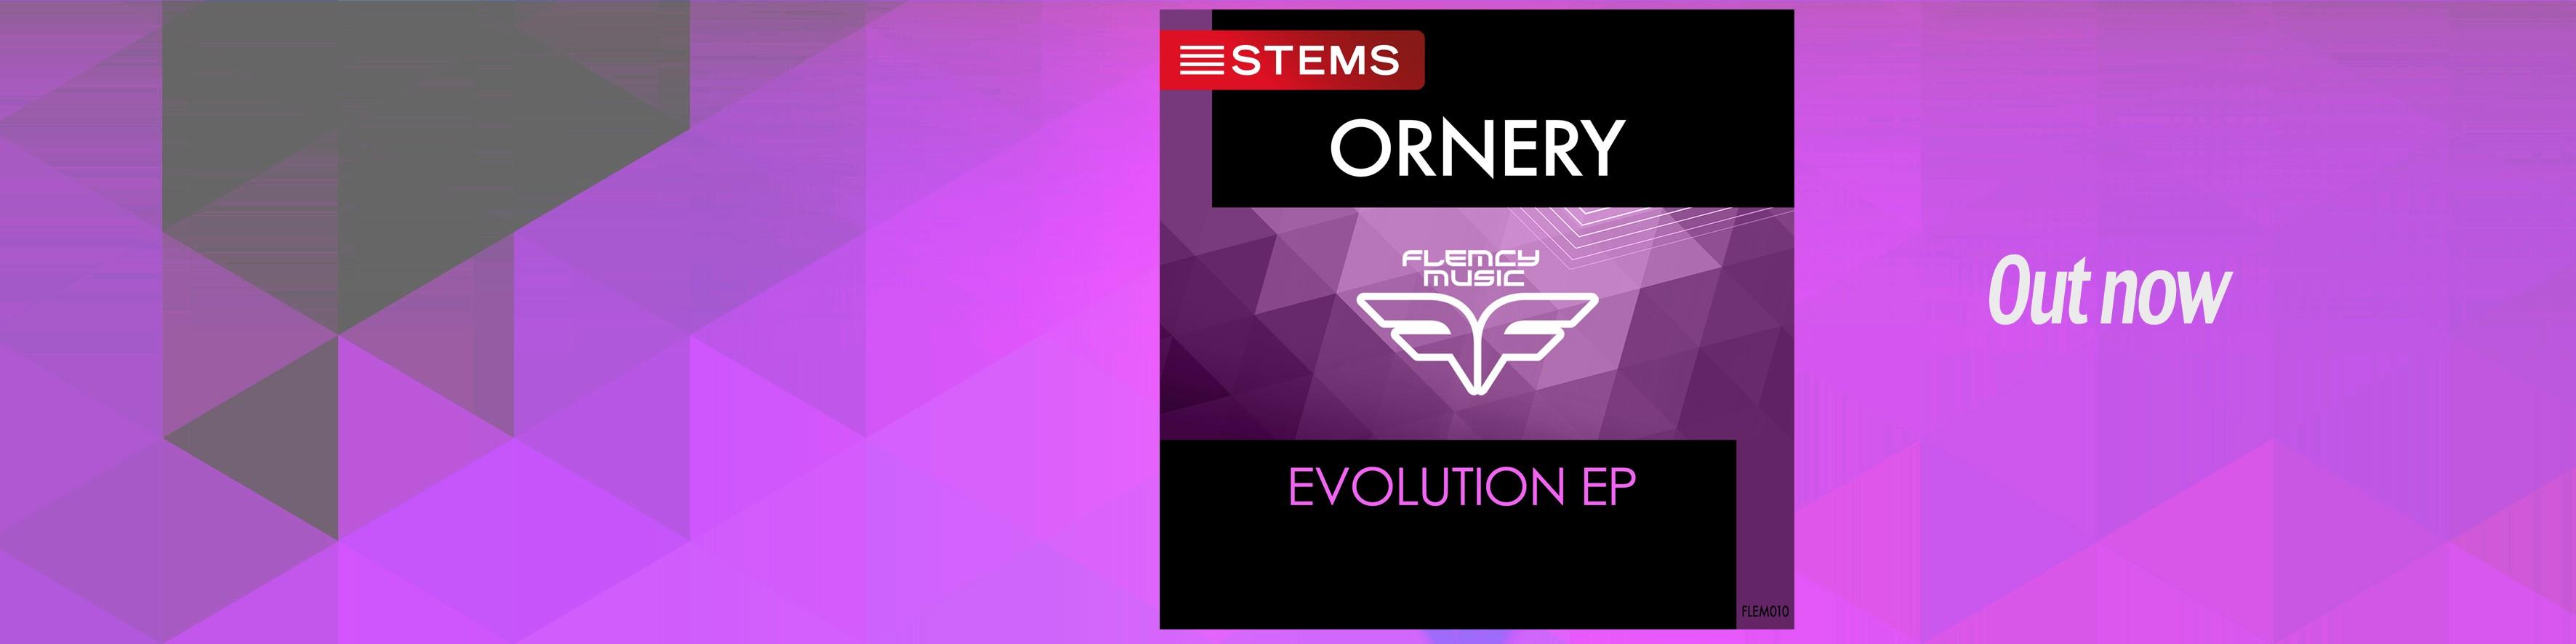 Flemcy slider Ornery – Evolution EP Stems